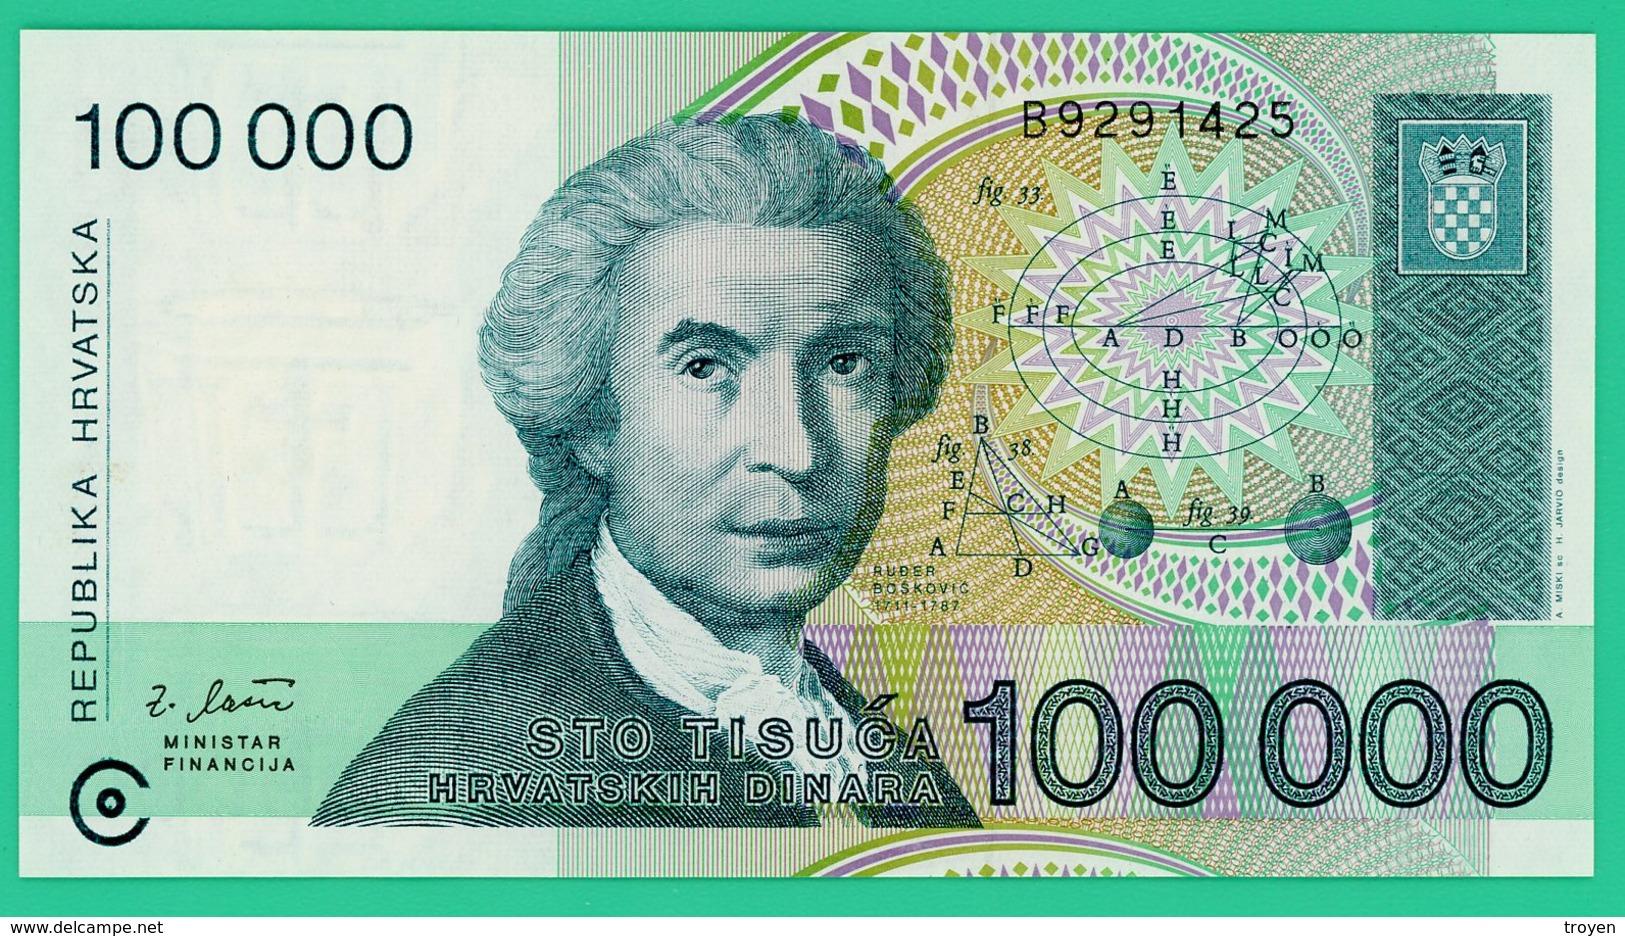 100 000 Dinar - Croatie - 1993 - N° B9291425 - Neuf - - Croatie